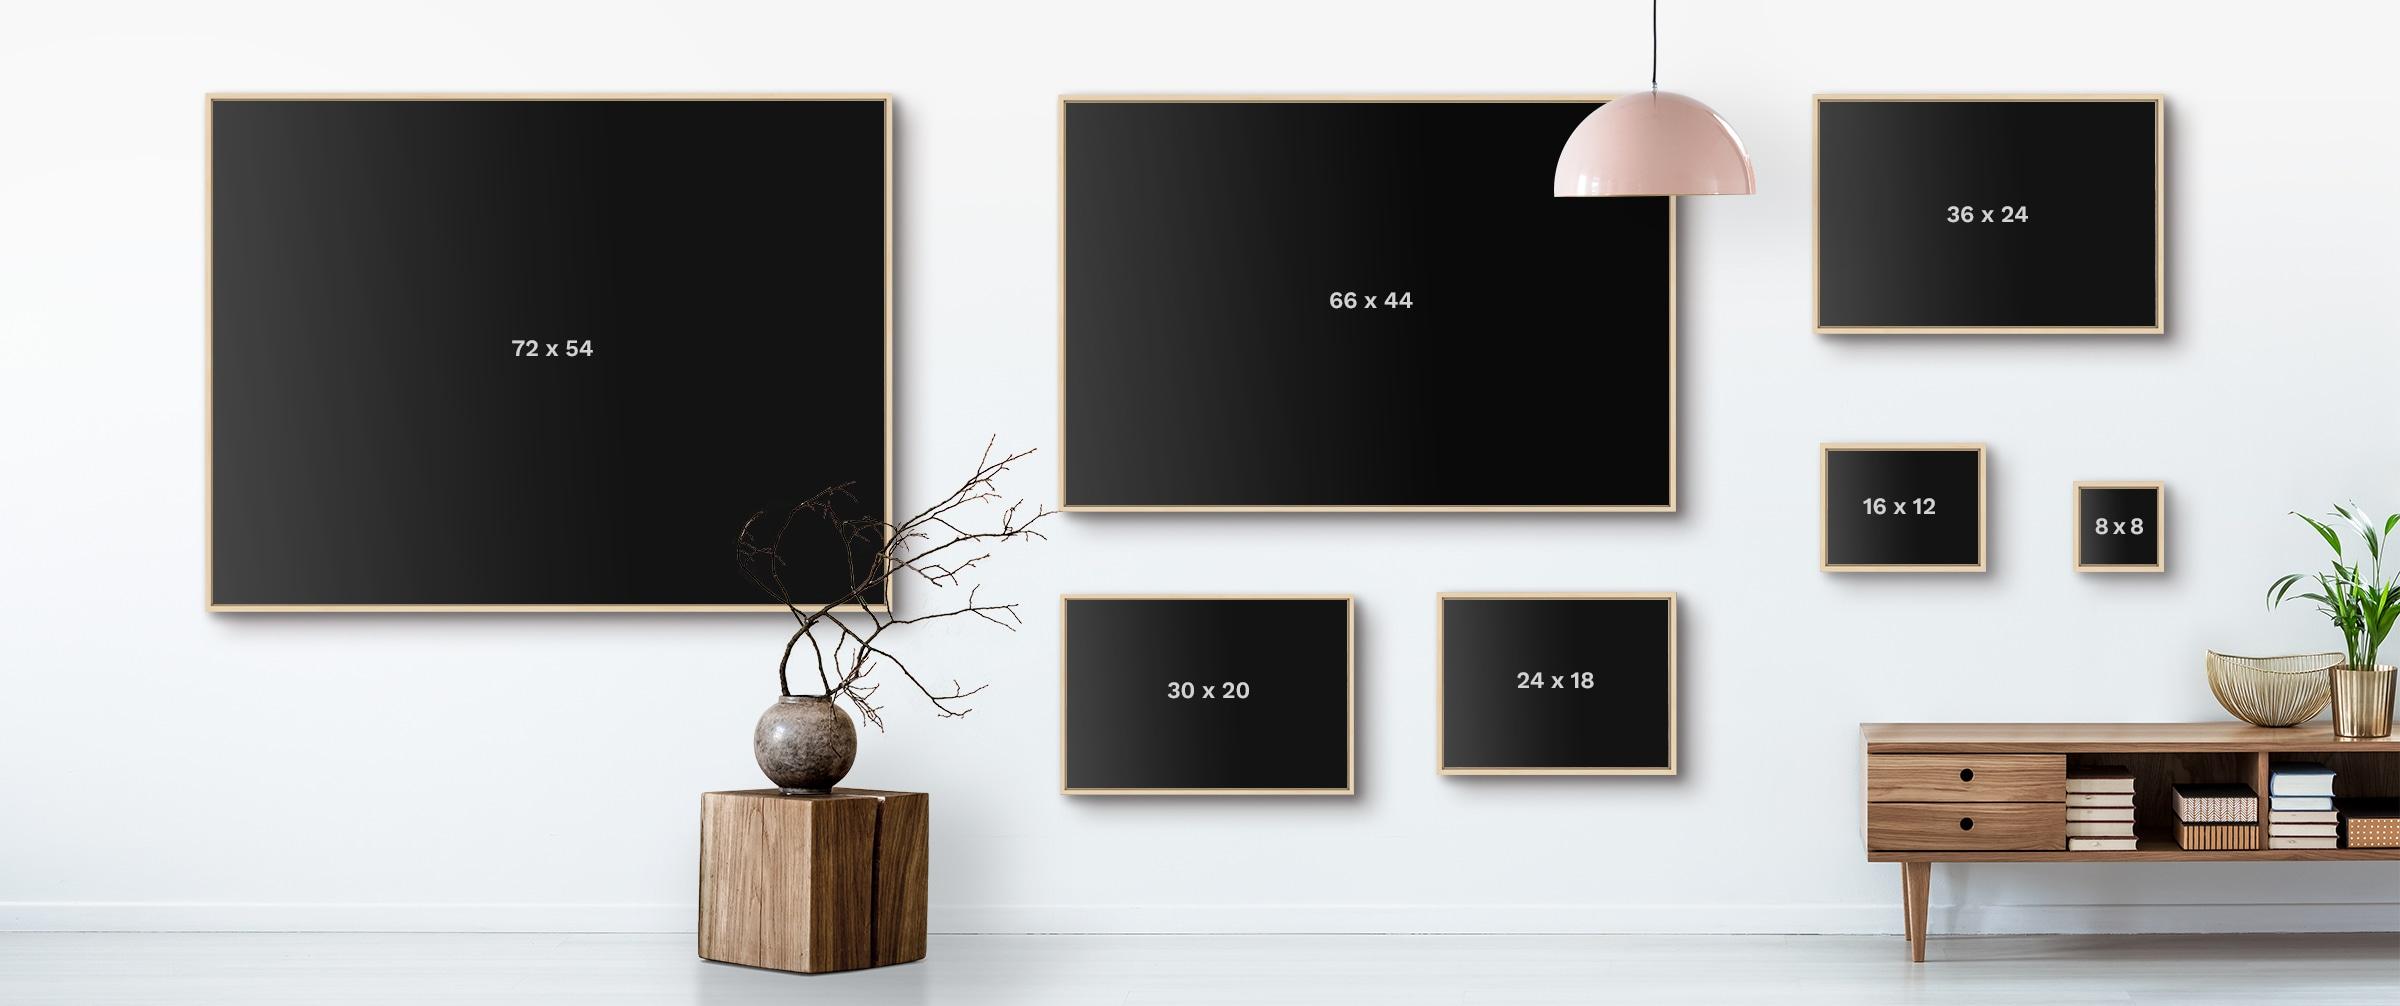 size-frise-frame-inch.jpg